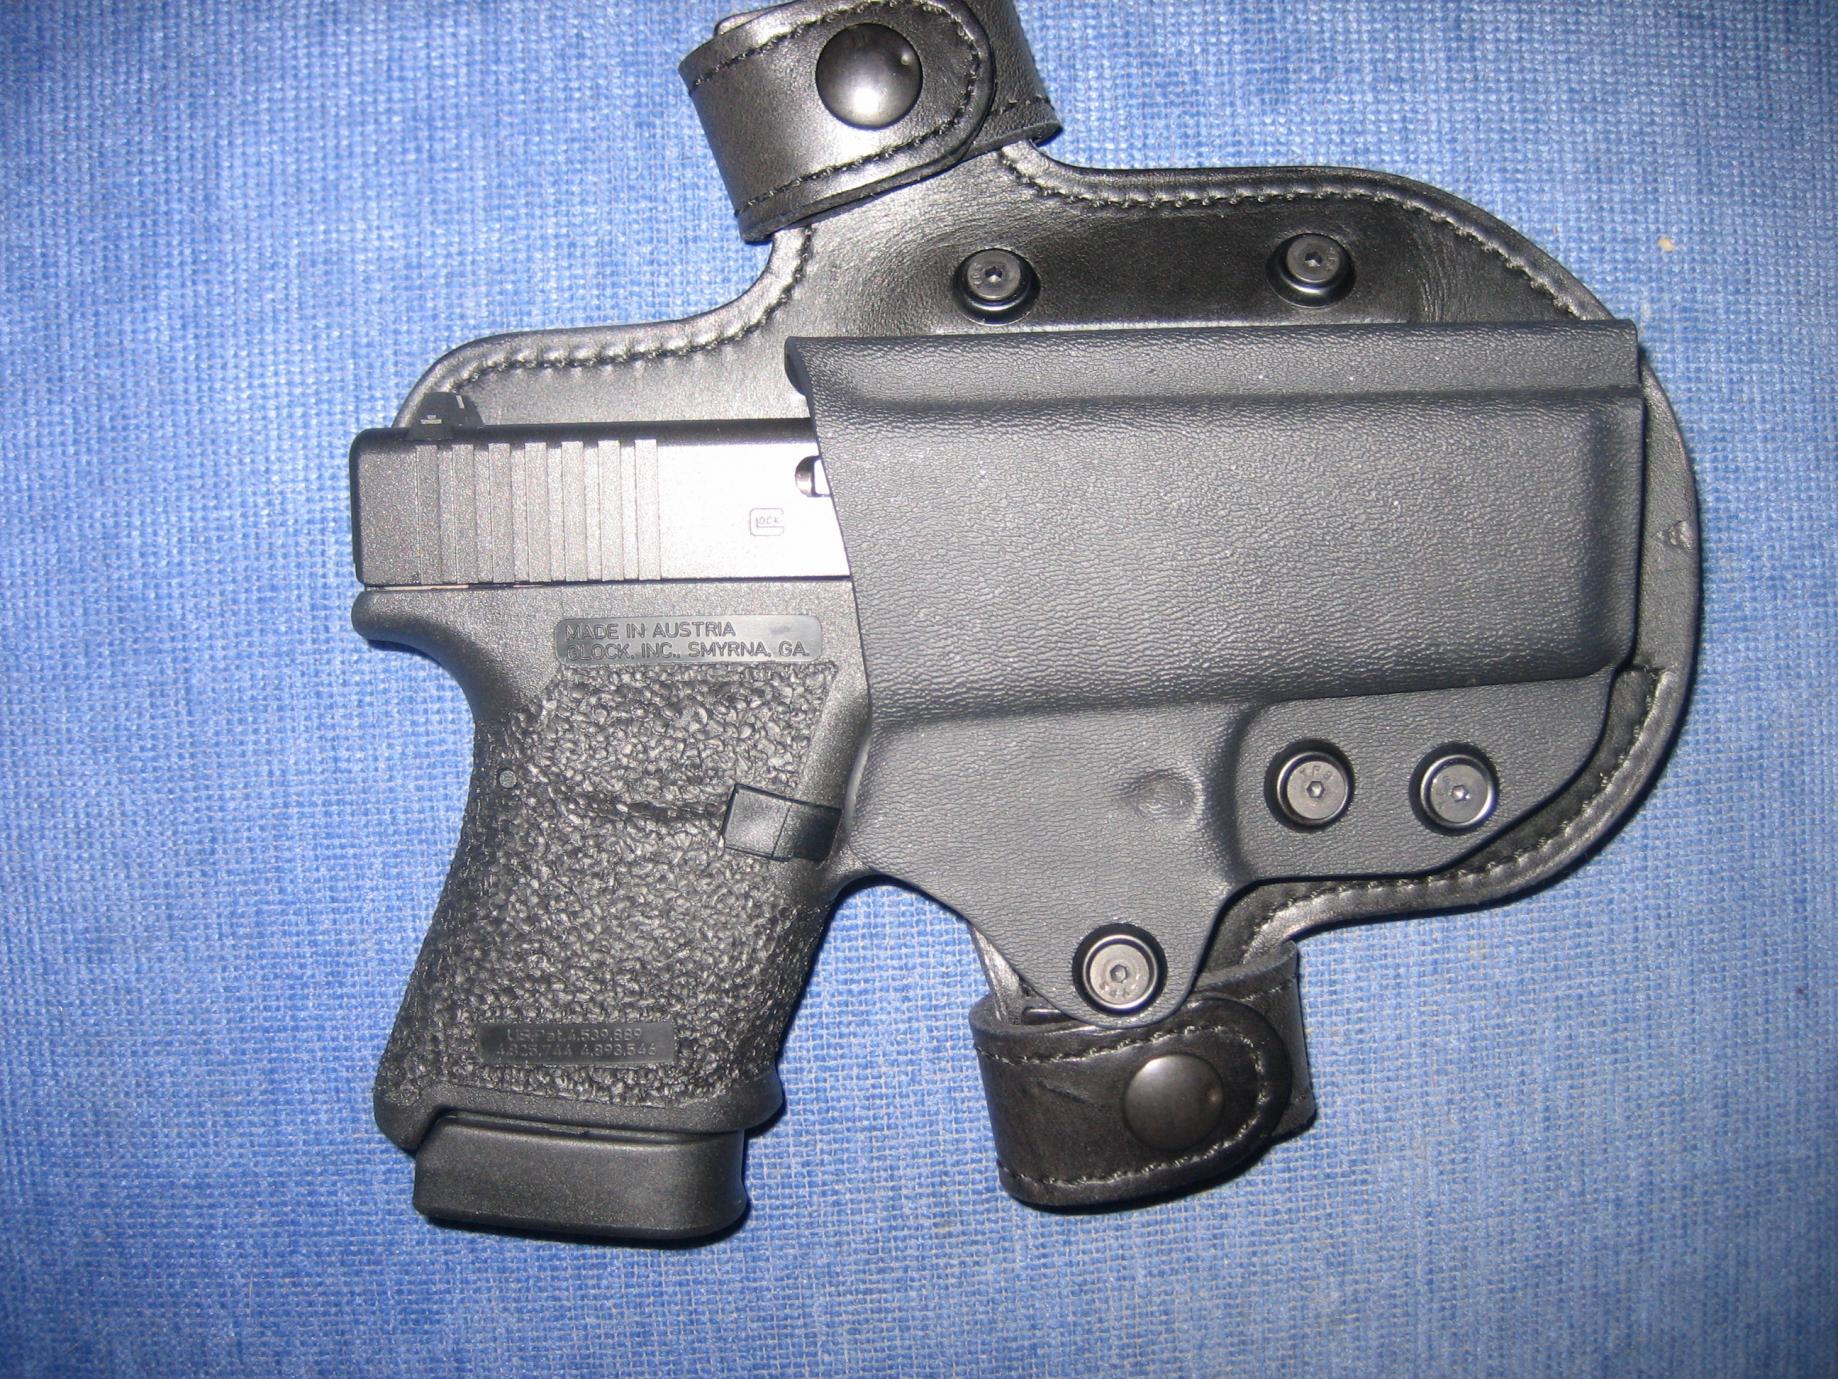 glock 36-grip-reduction-005.jpg